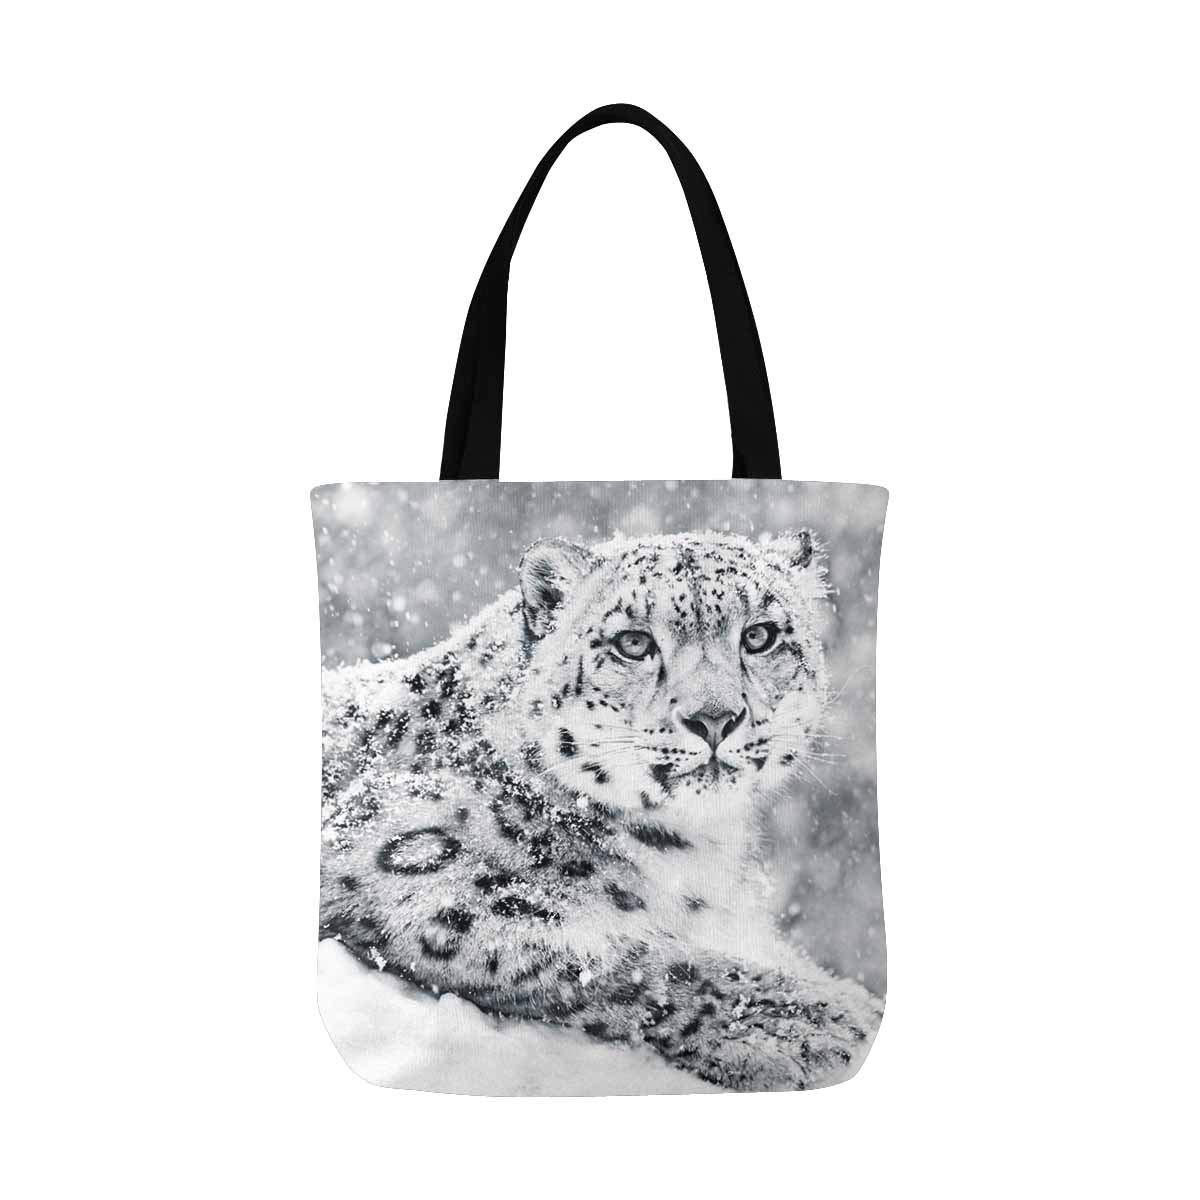 Ashleigh Snow Leopard In Snow Storm Cool Canvas Reusable